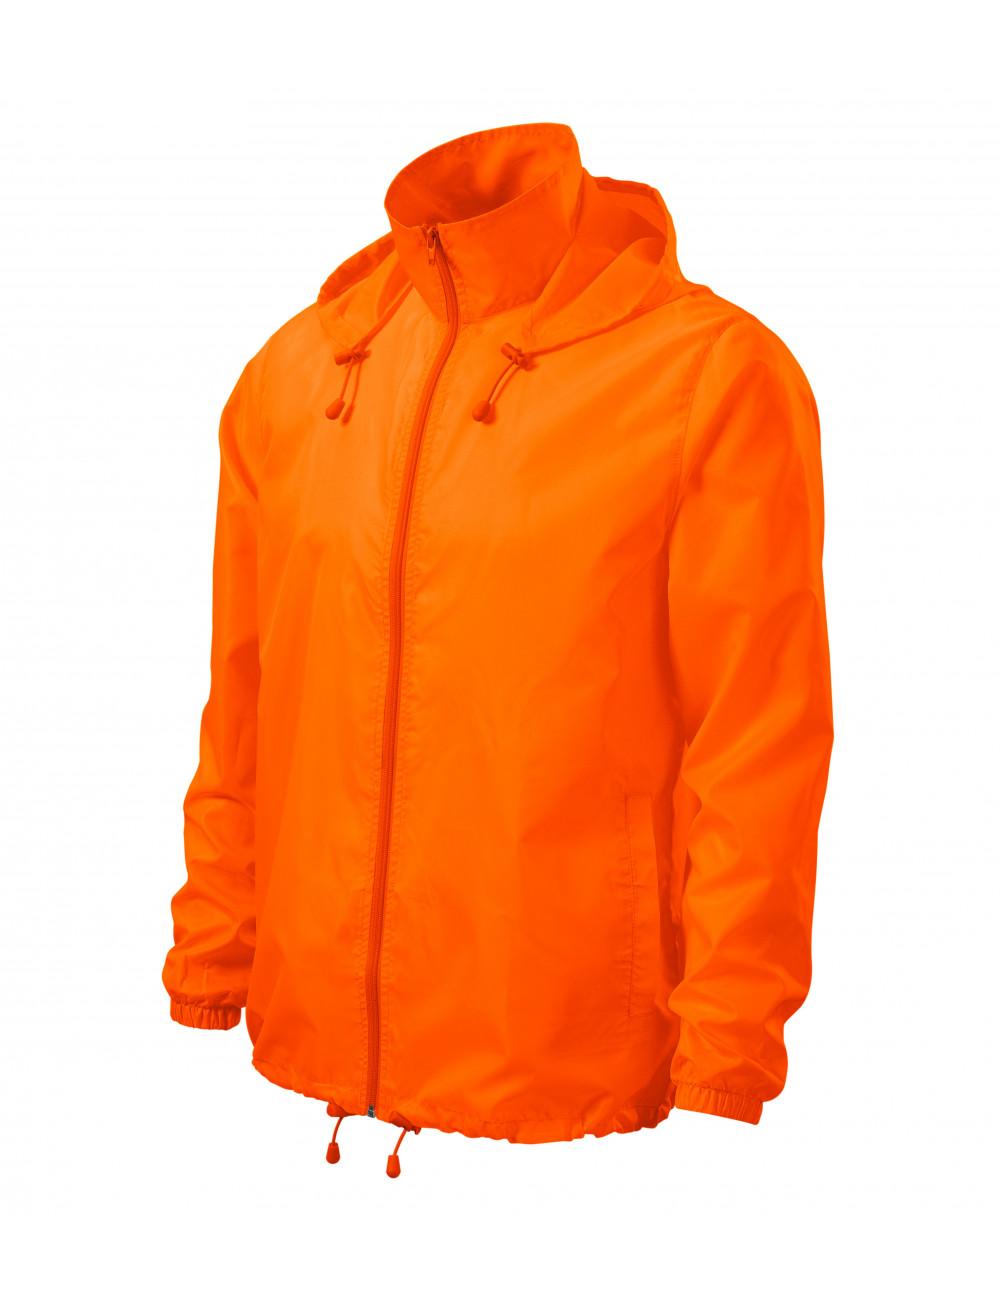 Adler MALFINI Wiatrówka unisex Windy 524 neon orange